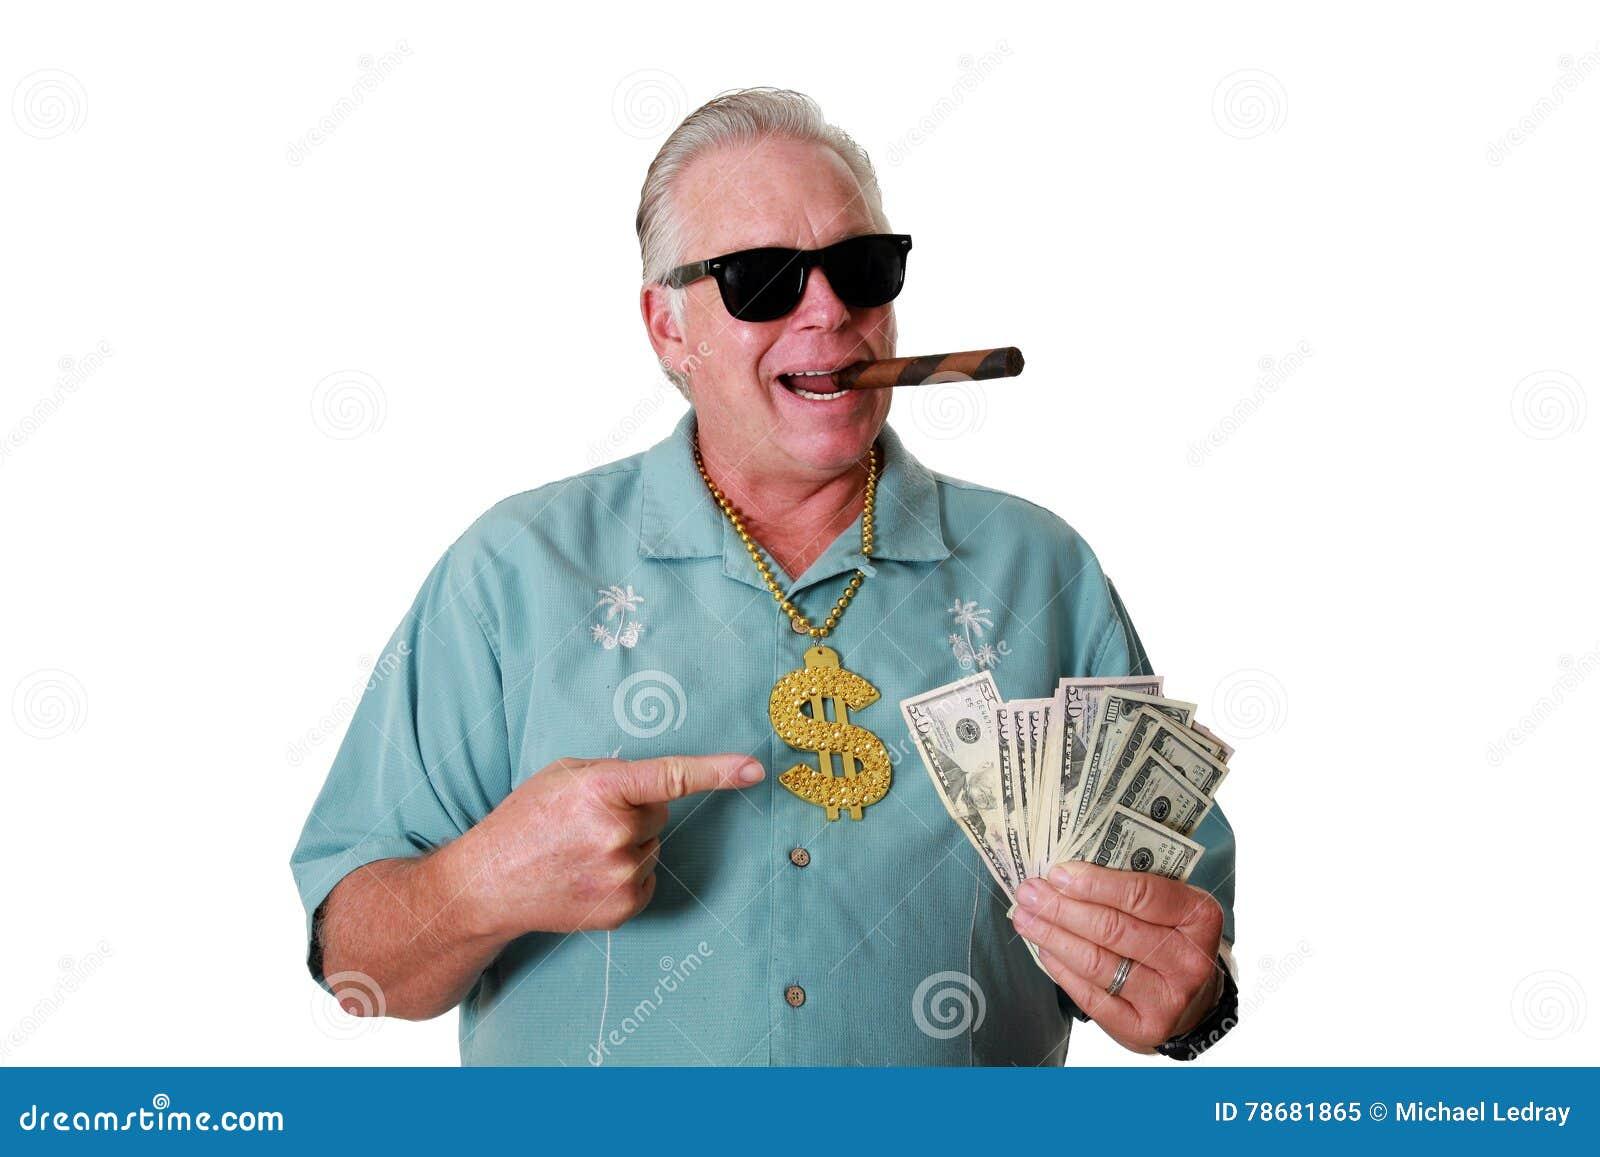 Een mens met geld Een mens wint geld Een mens heeft Geld Een mens snuift Geld Een mens houdt van Geld Een mens en zijn geld Een m